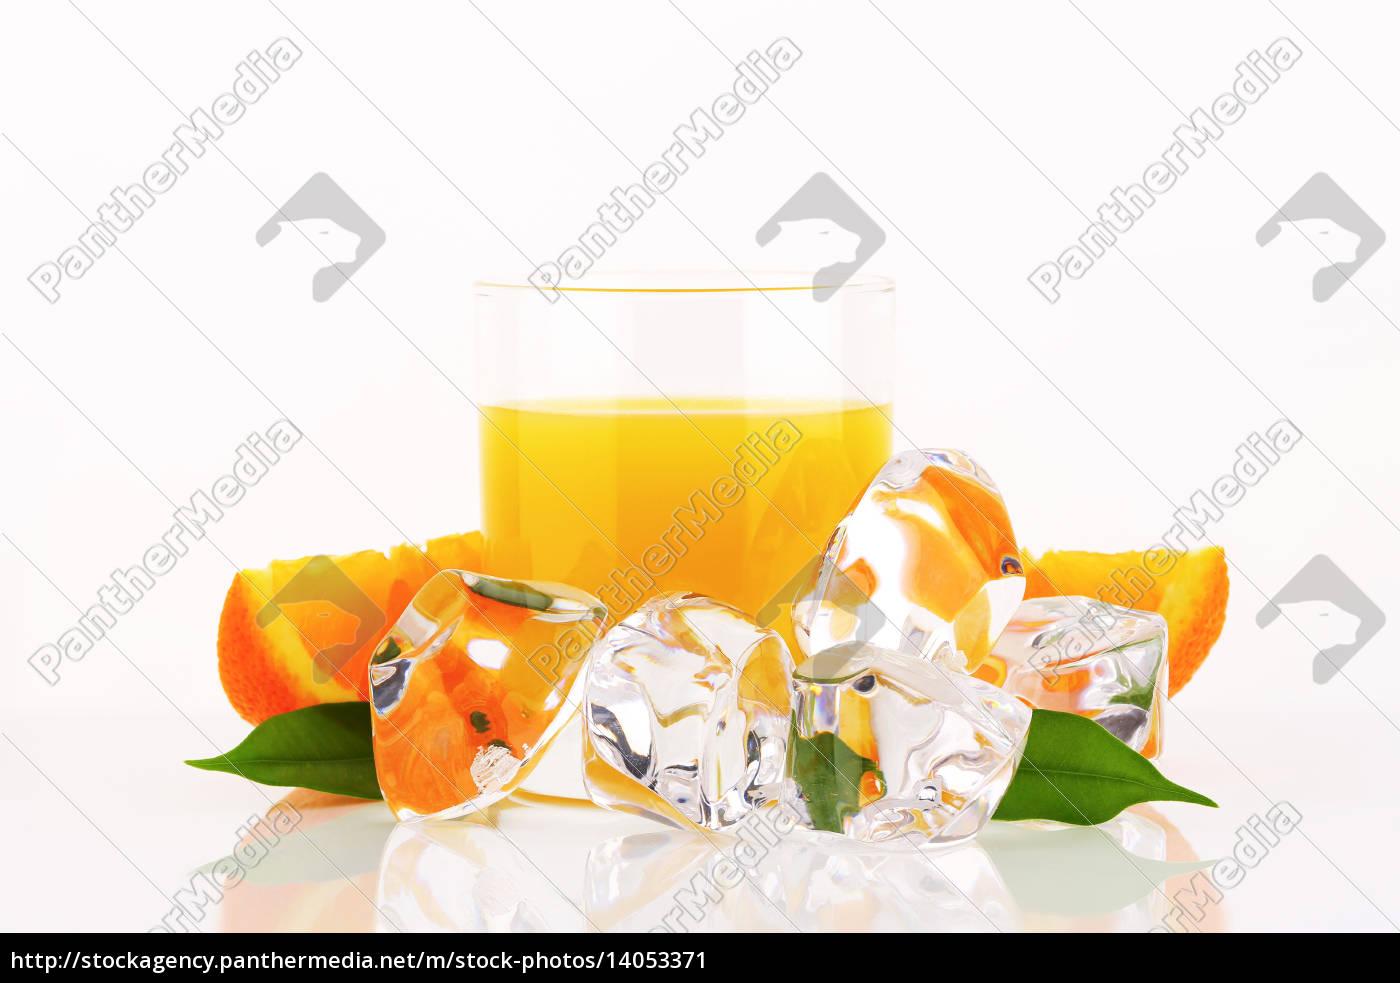 orange, juice - 14053371